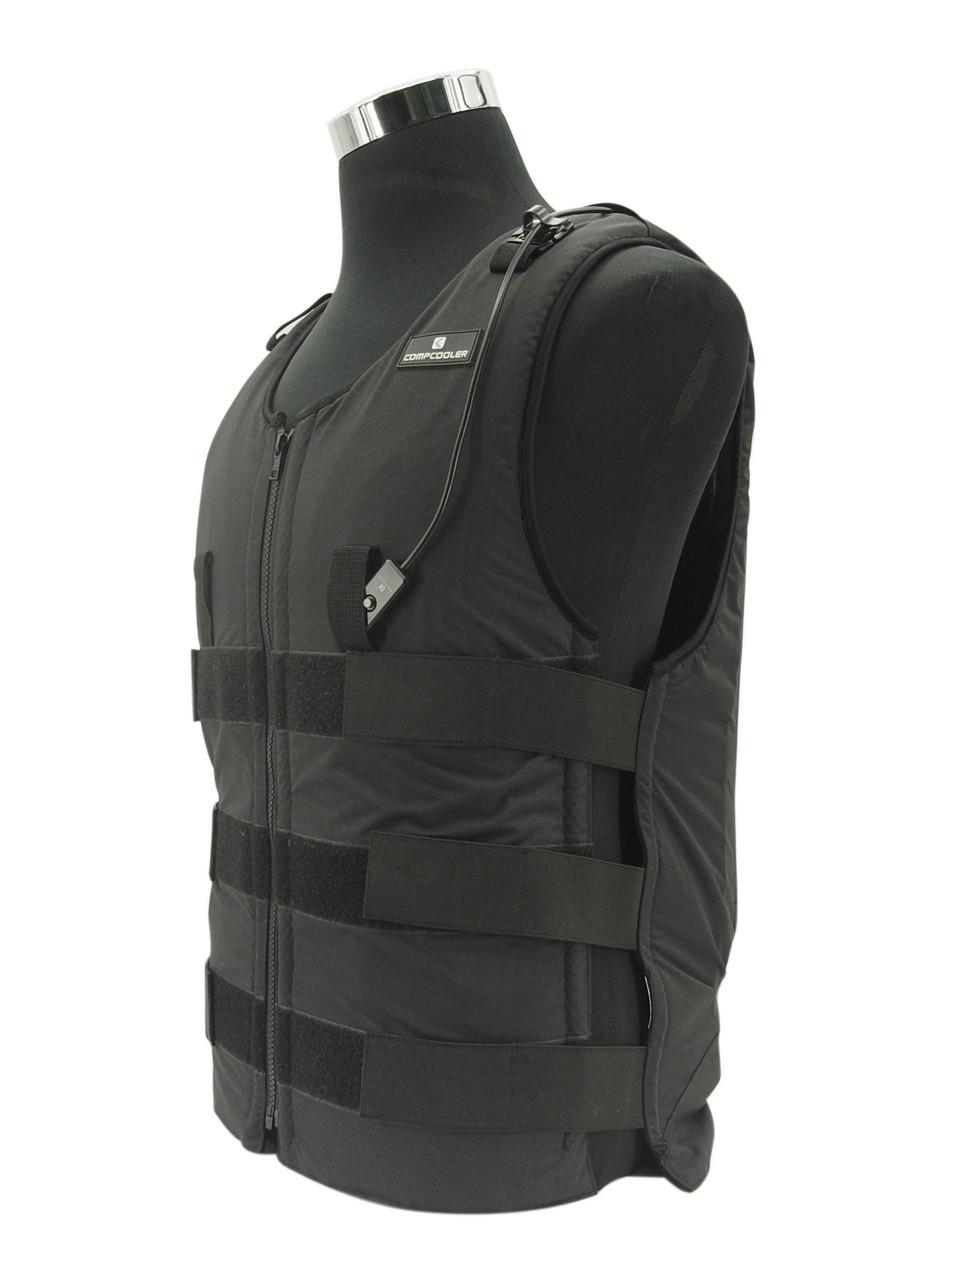 Ice Water Circulating Cooling Vest Black Detachable Bladder